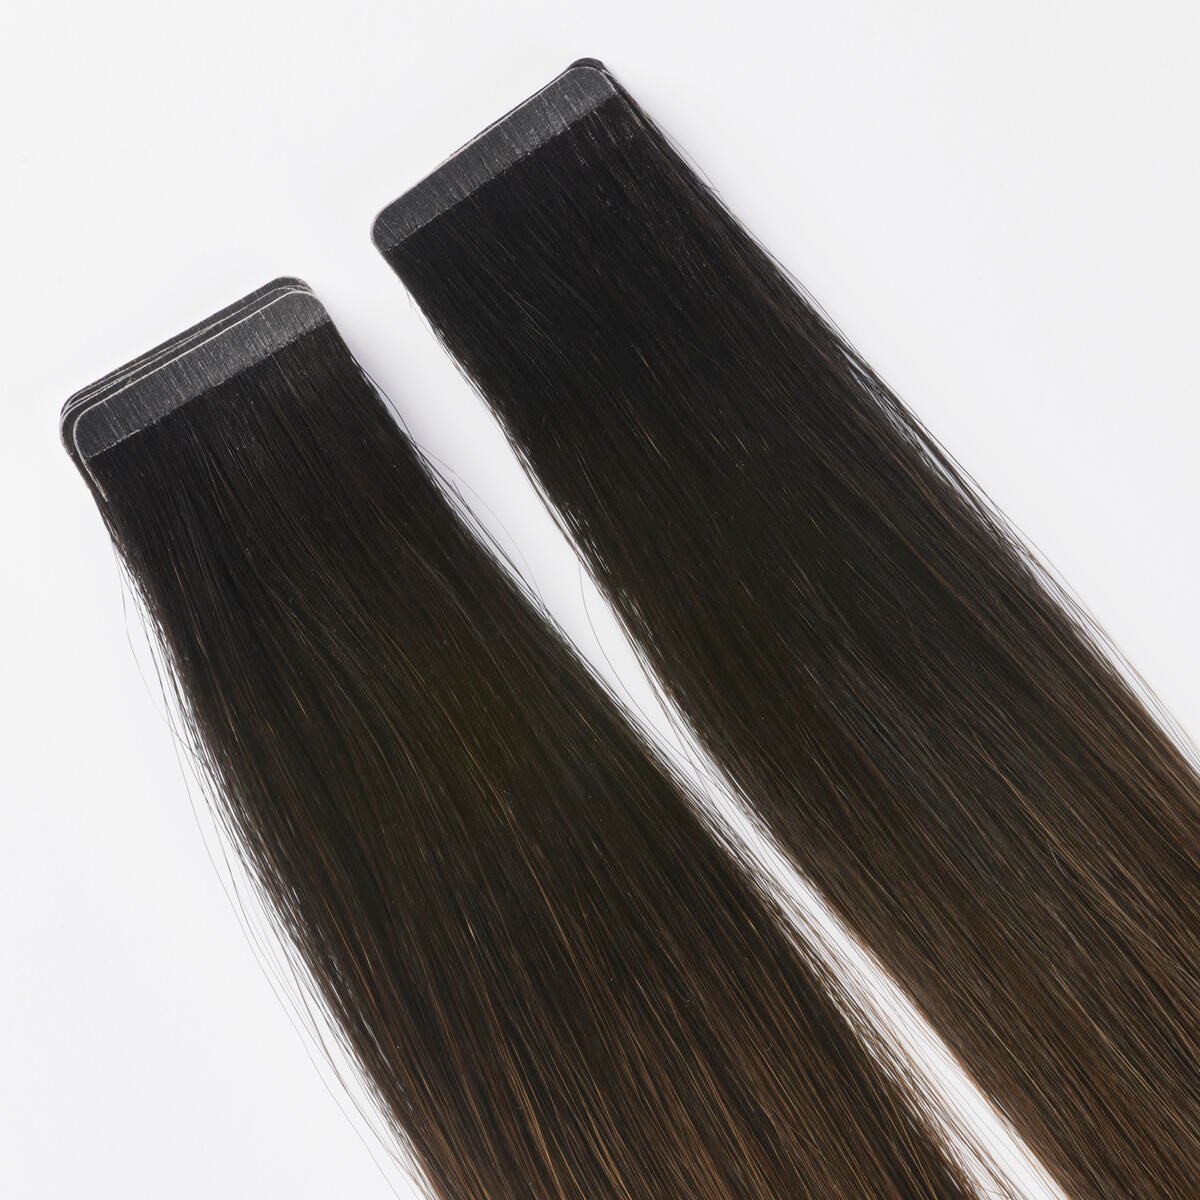 Sleek Tape Extension Premium C1.2/5.0 Deep Brown ColorMelt 45 cm